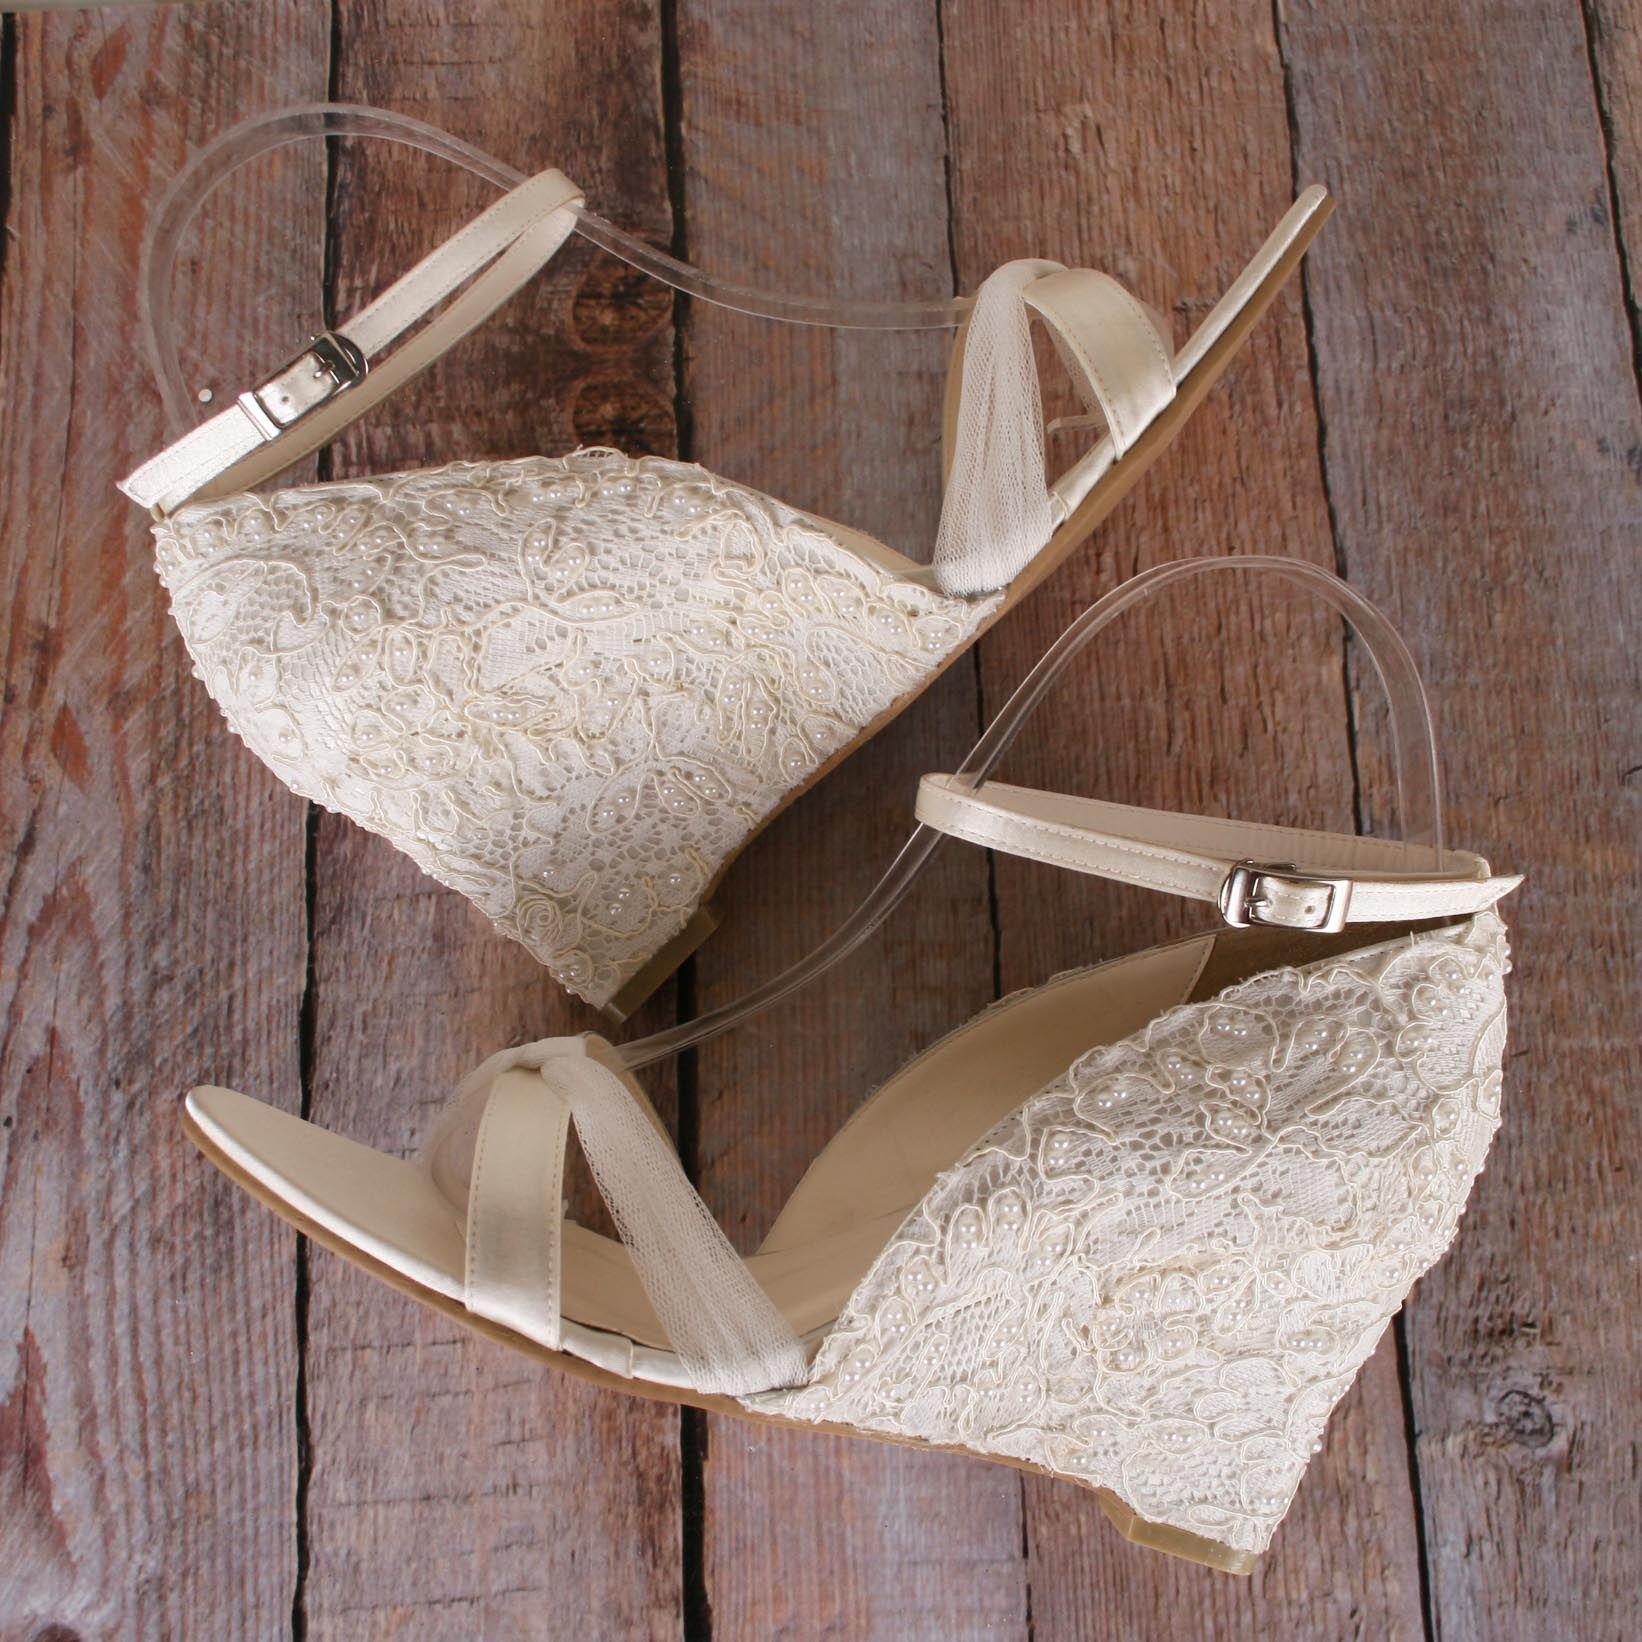 ivory wedges lace wedding shoes lace wedges ivory lace shoes lace wedding